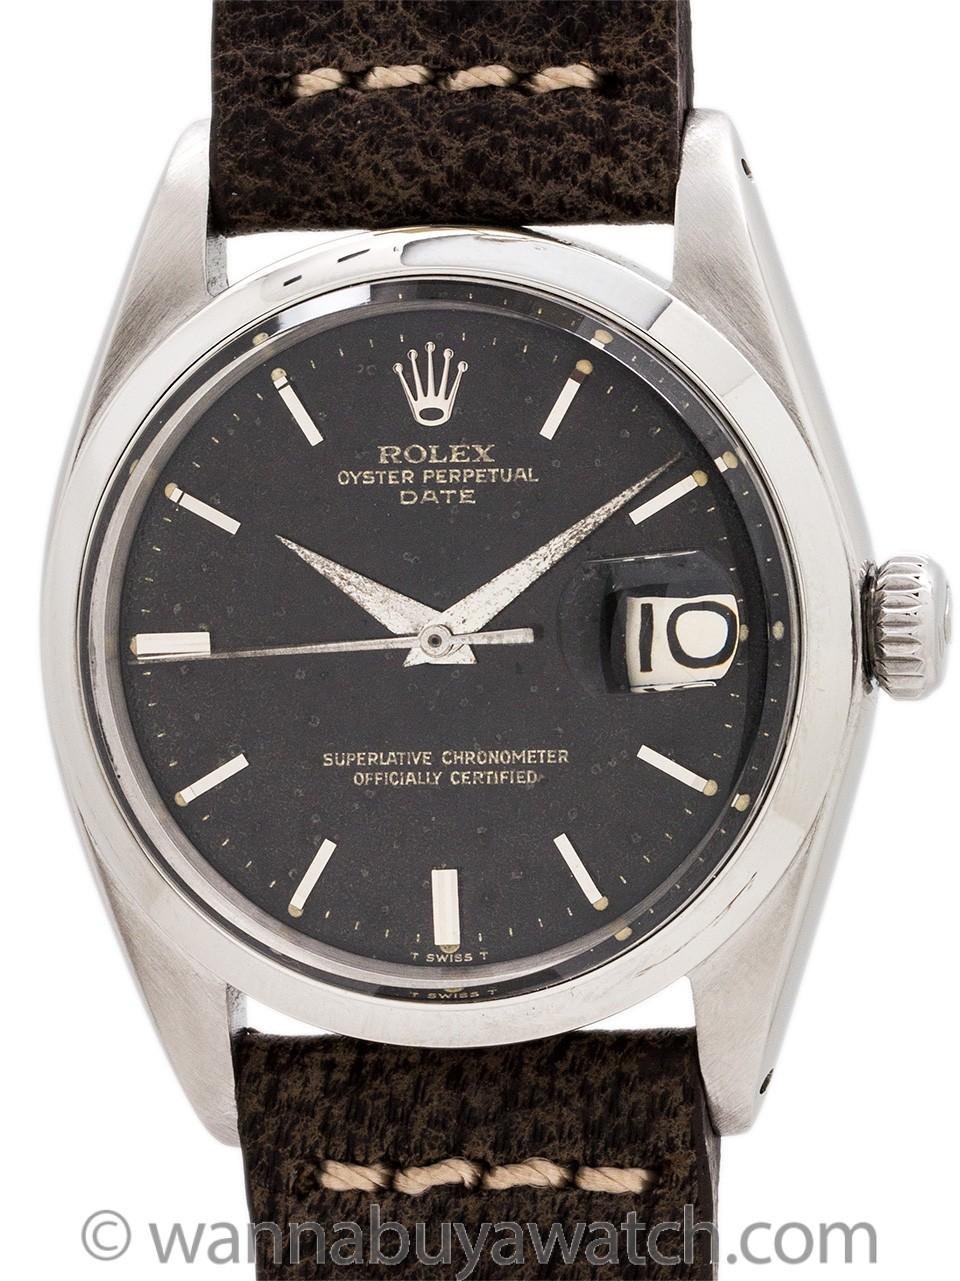 Rolex Oyster Perpetual Date ref 1500 Black Gilt Dial circa 1964